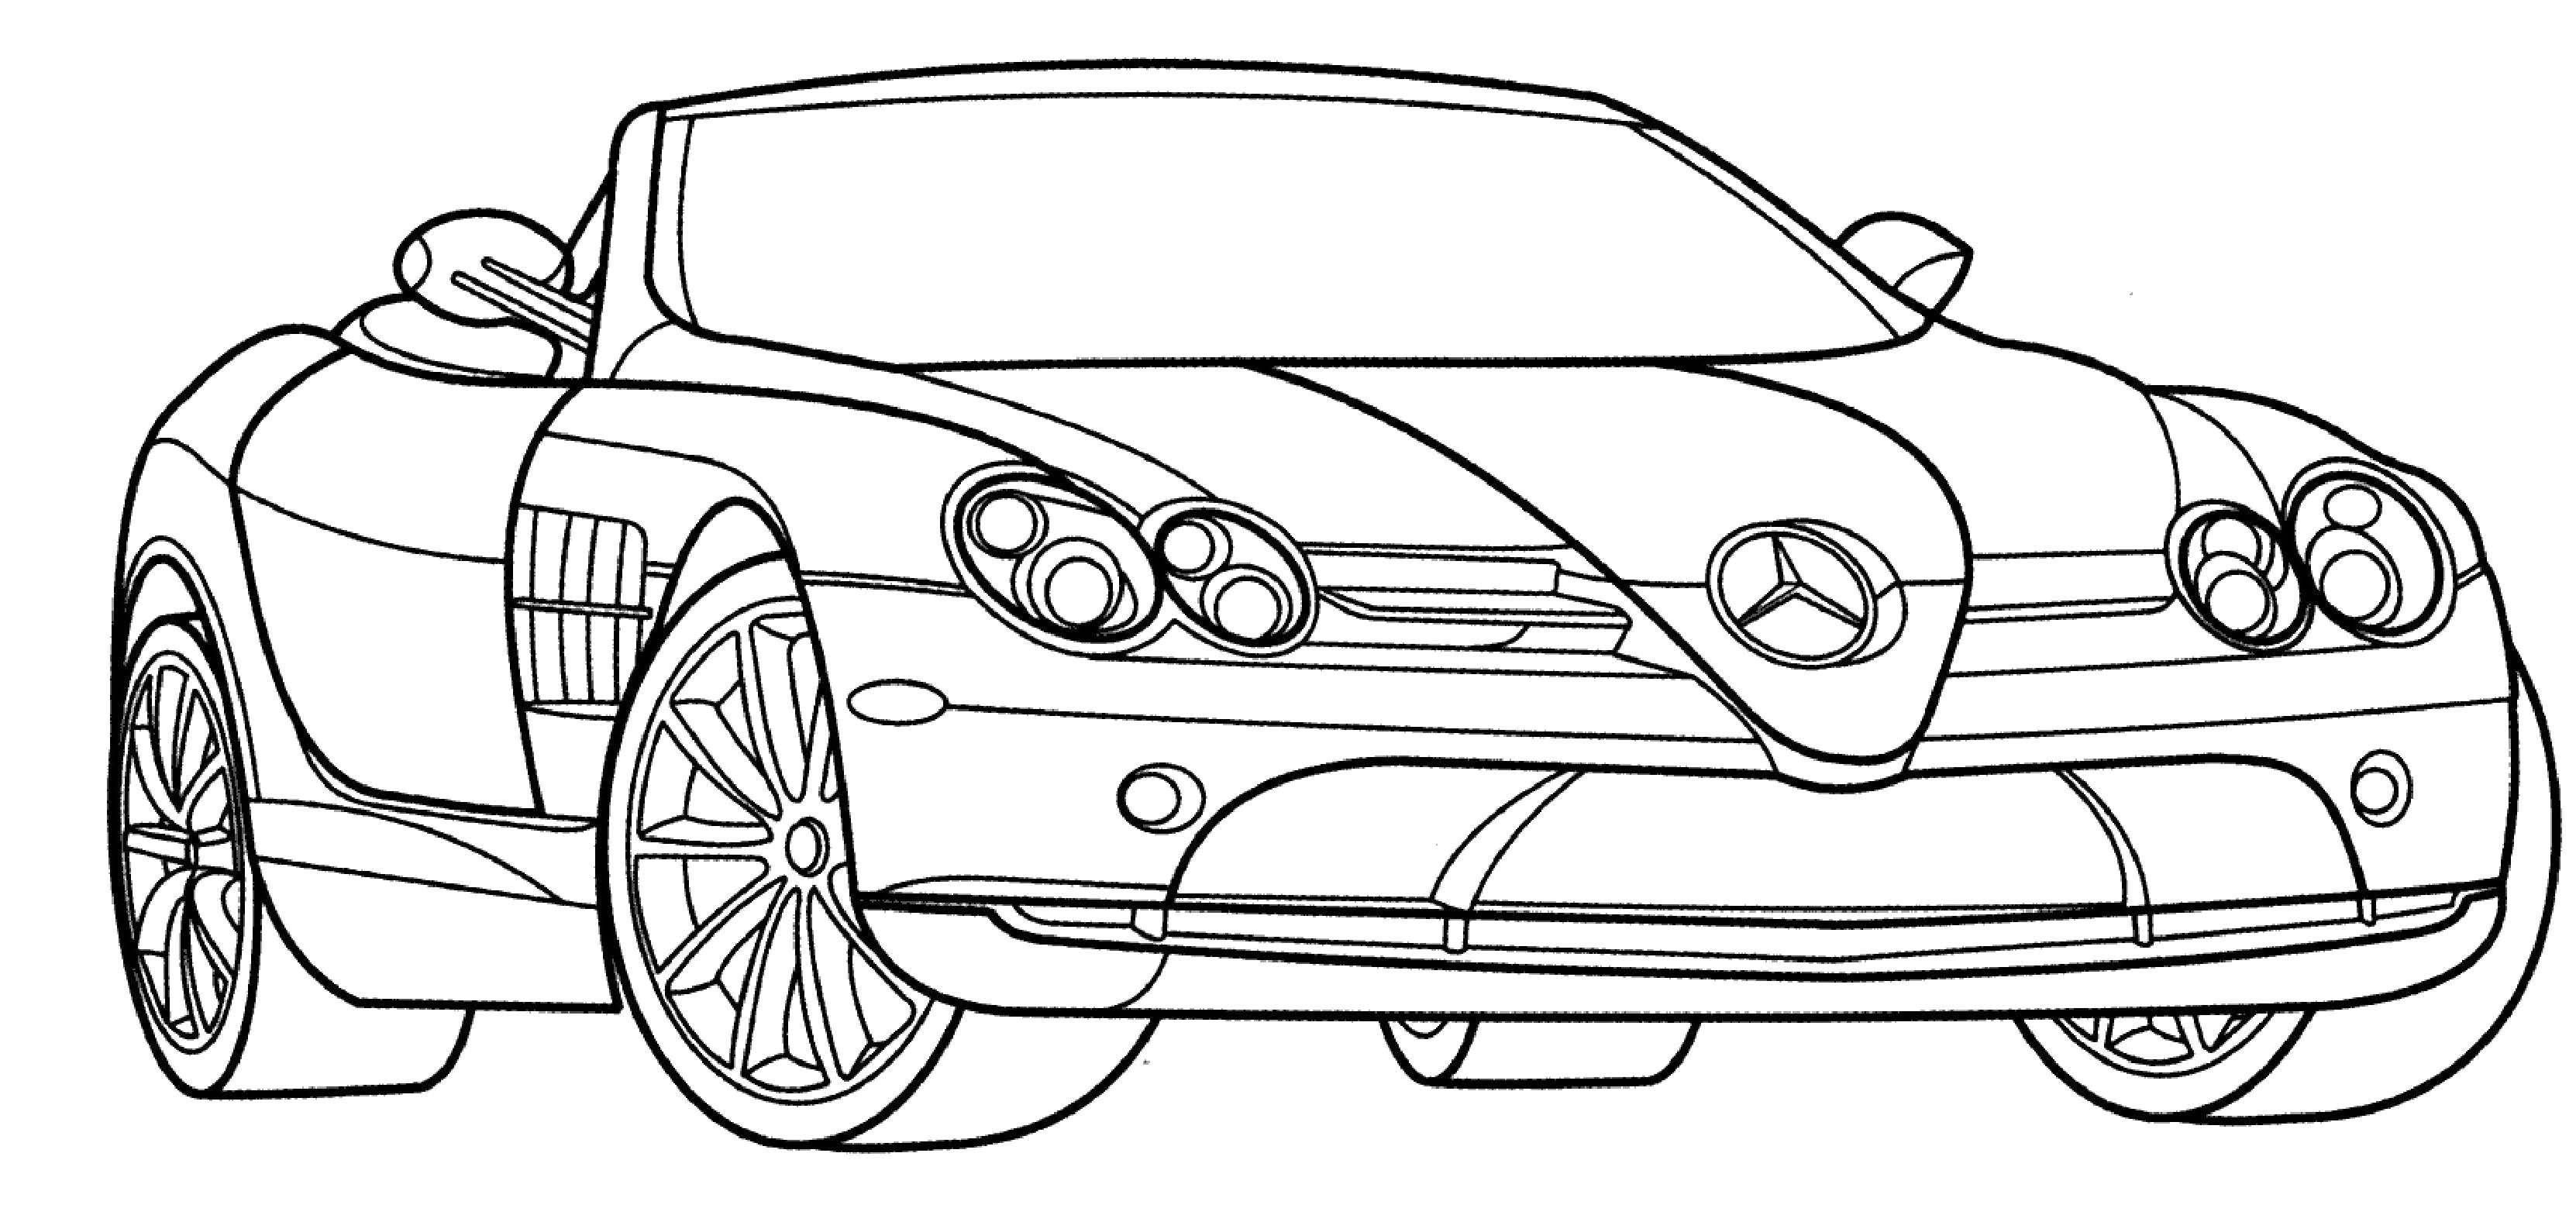 3324x1568 Sports Car Tuning